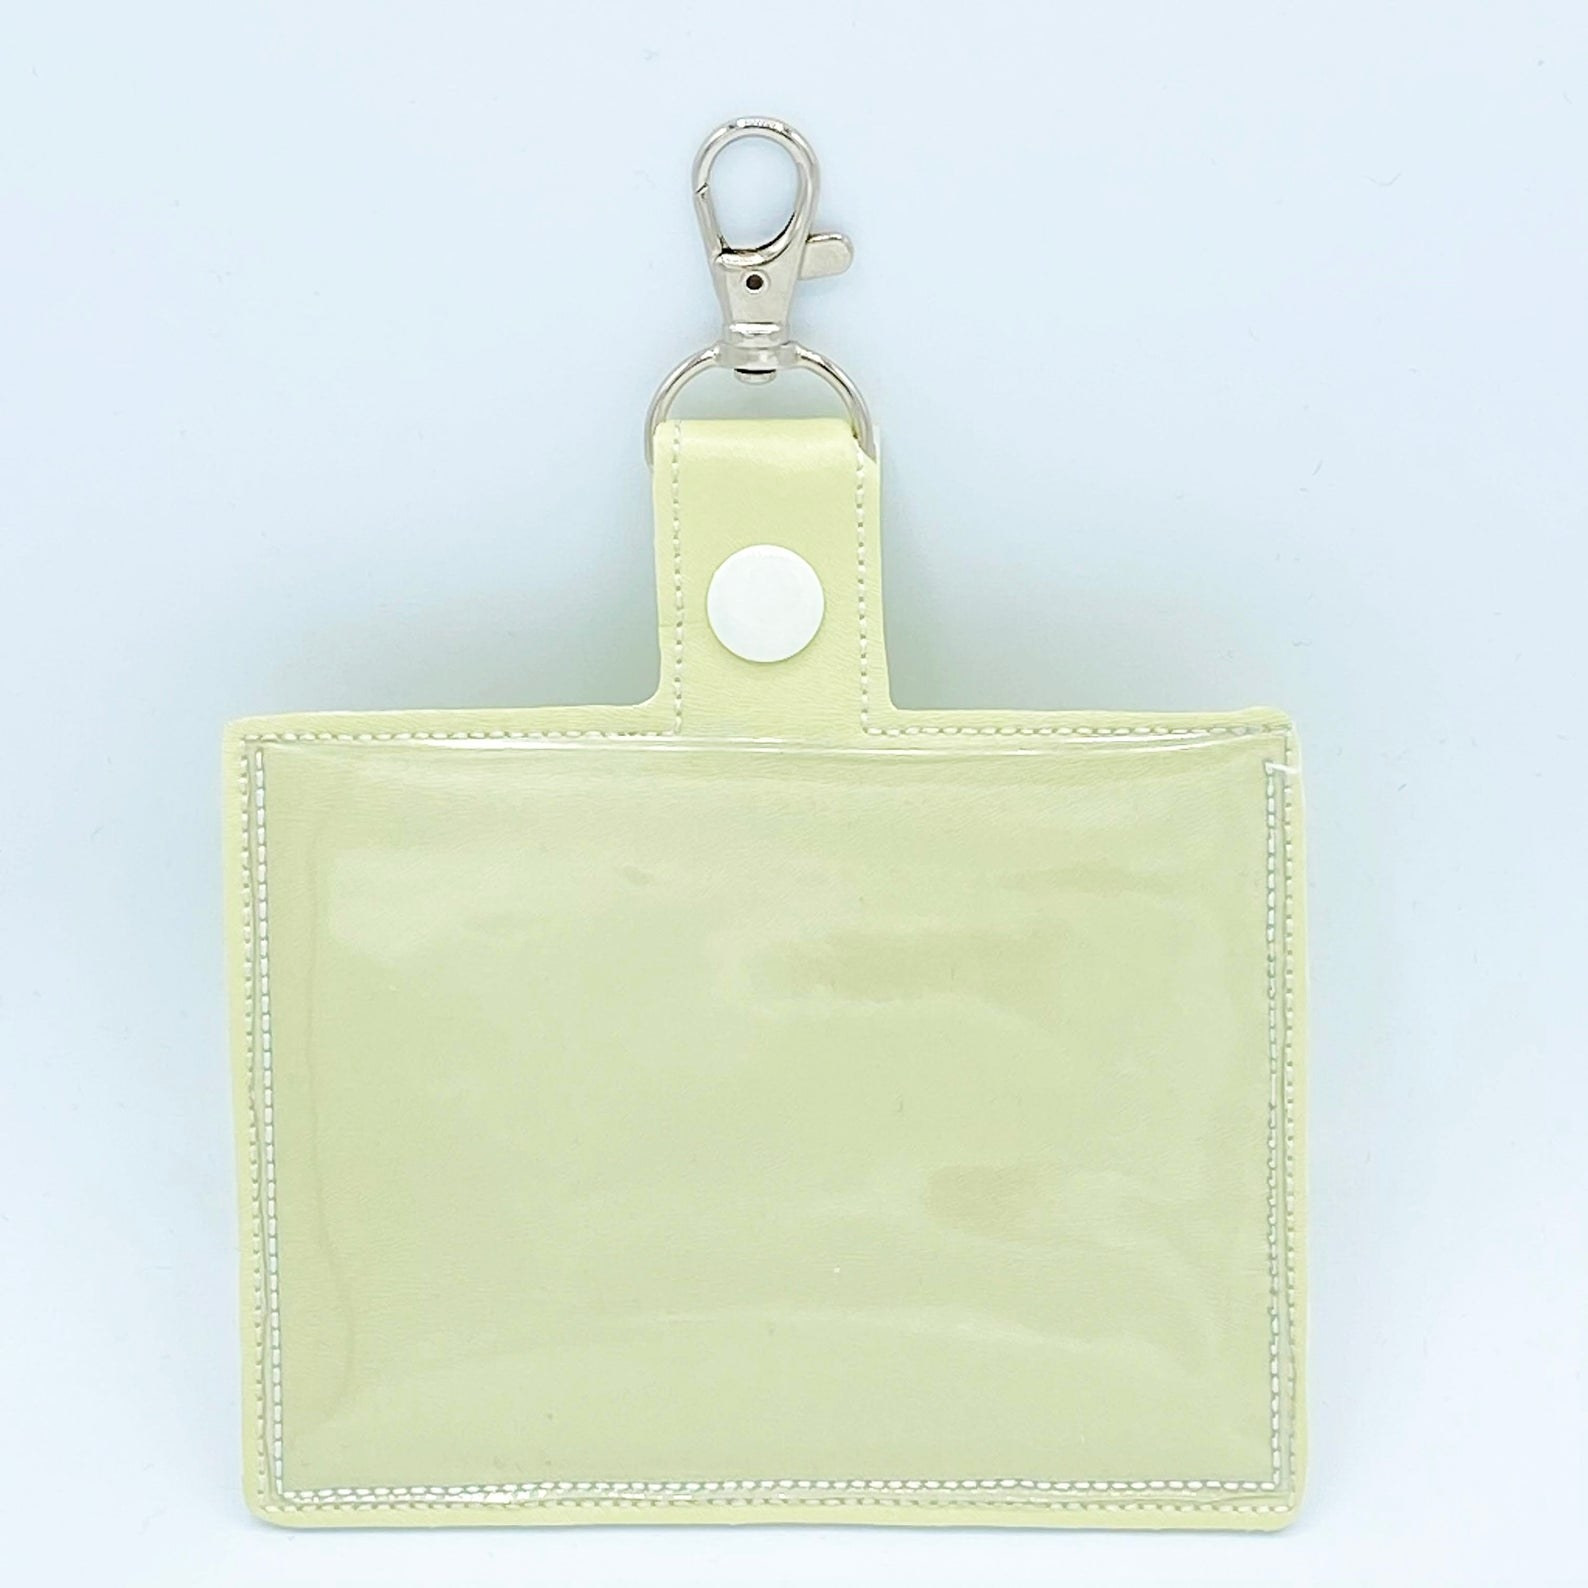 light yellow vaccine holder